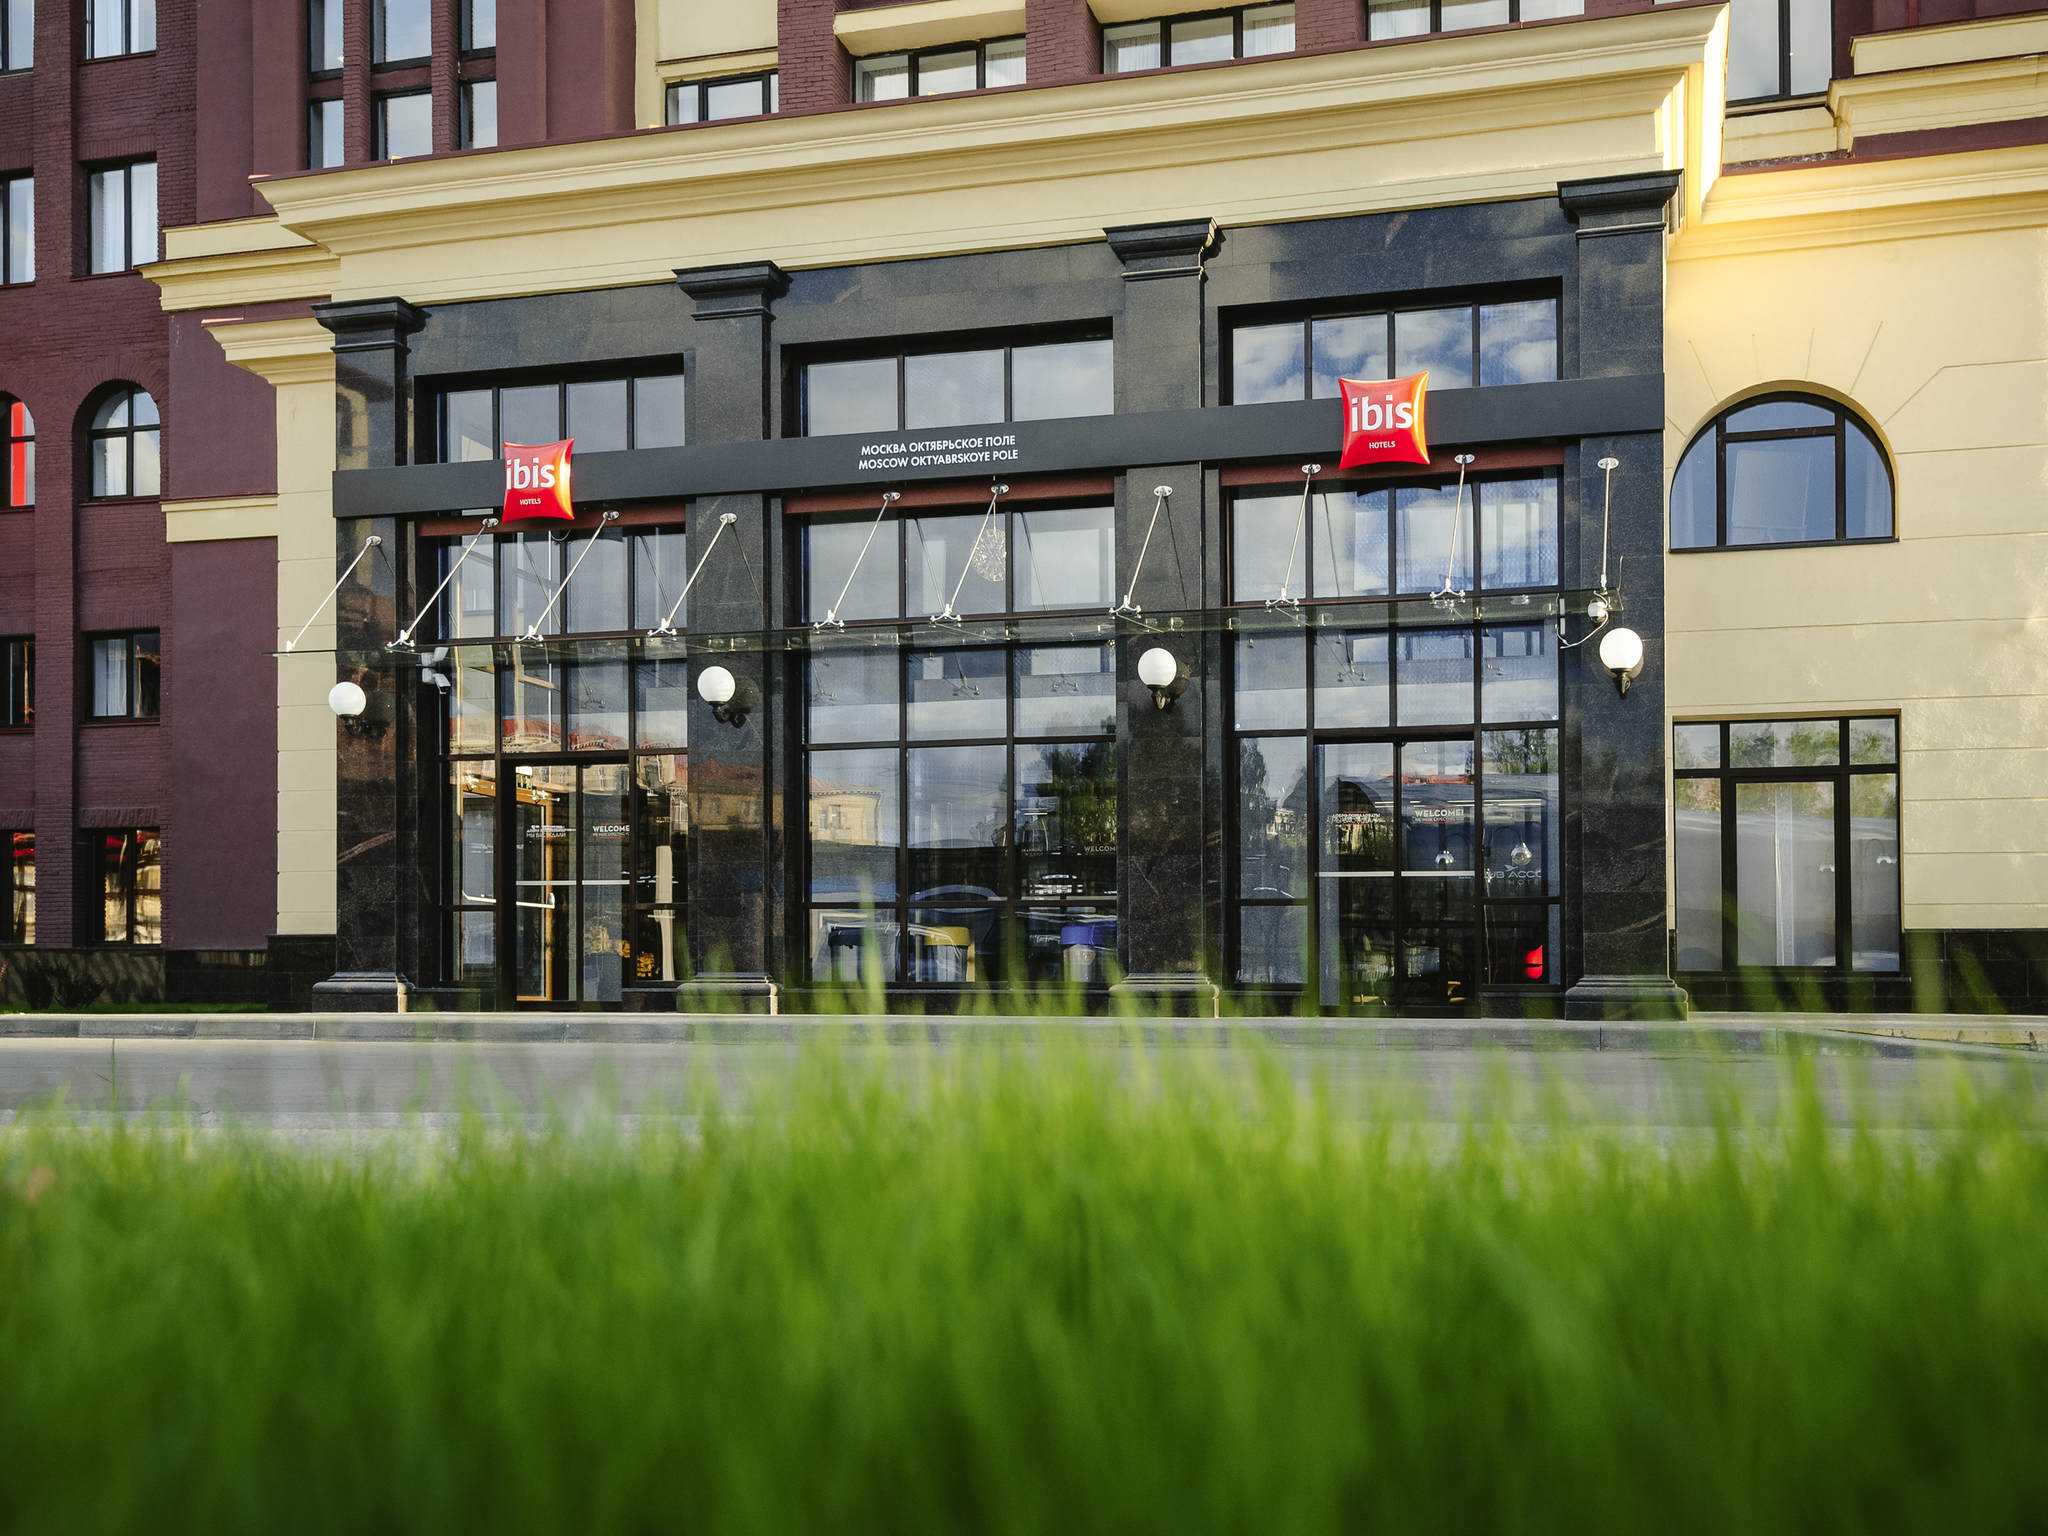 فندق - إيبيس Ibis موسكو أوكتيابرسكوي بول